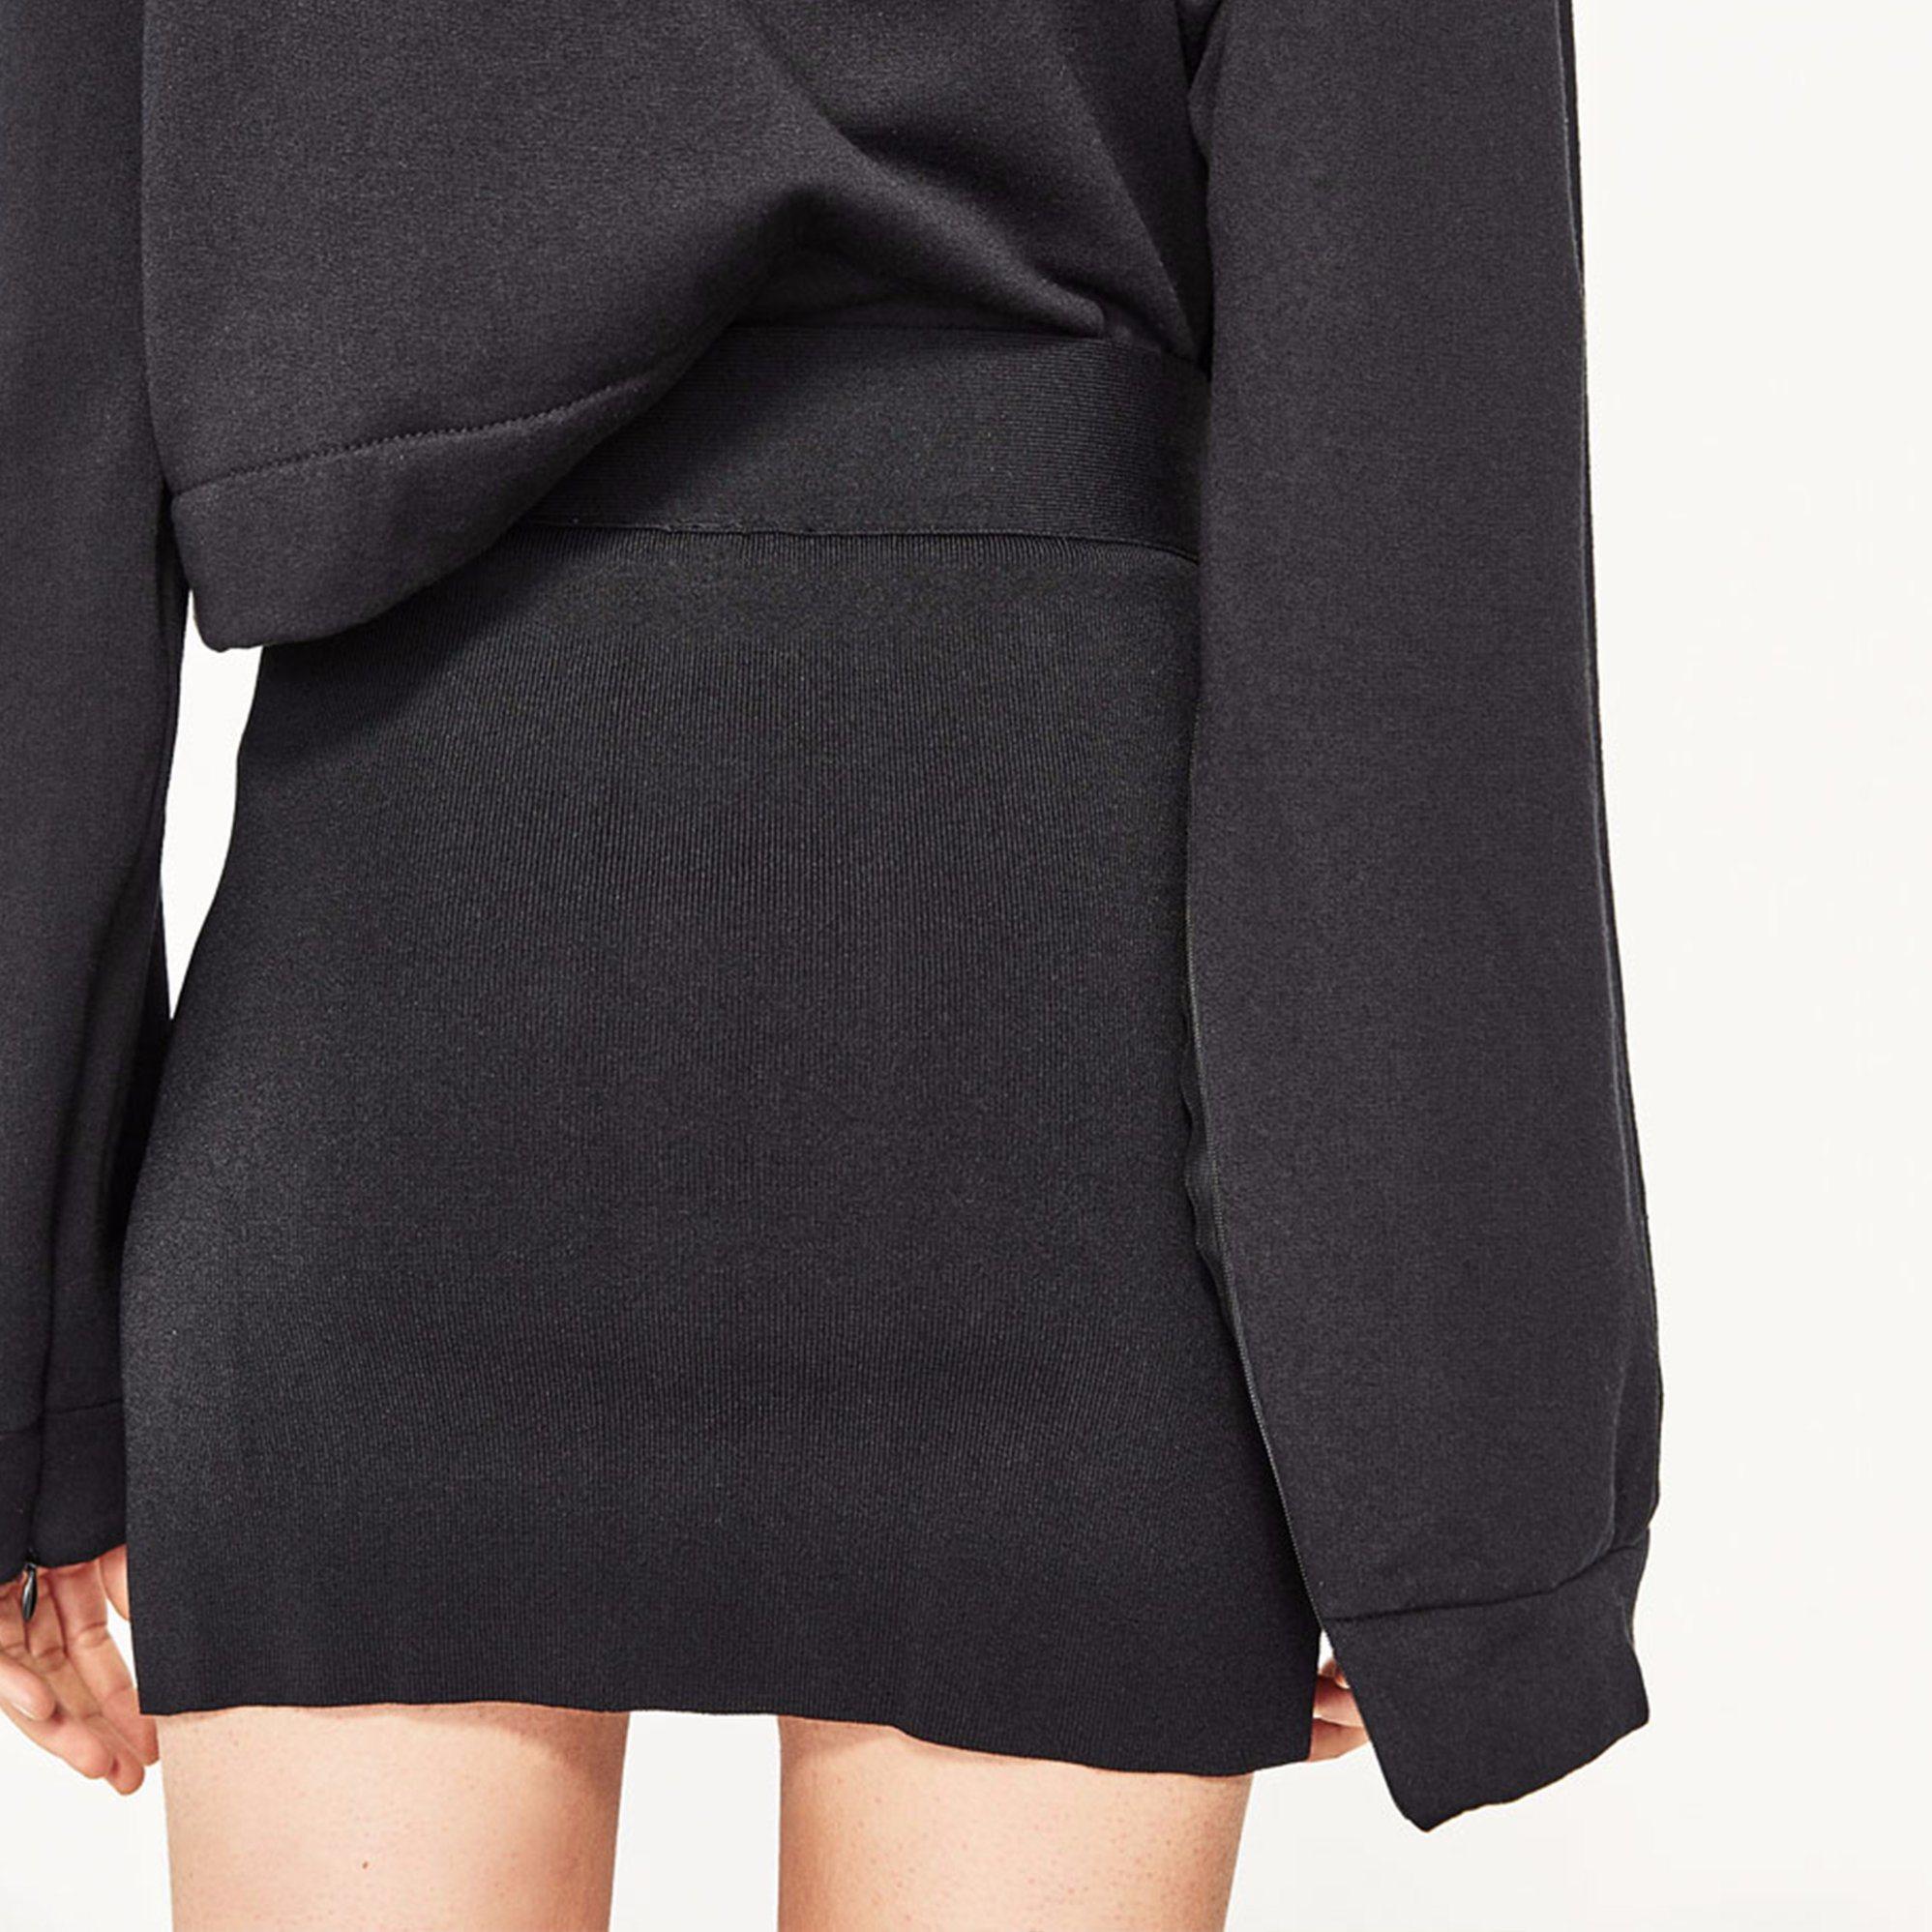 Ladies Fashion Chiffon Preppy Style Bandage Mini Short Skirt